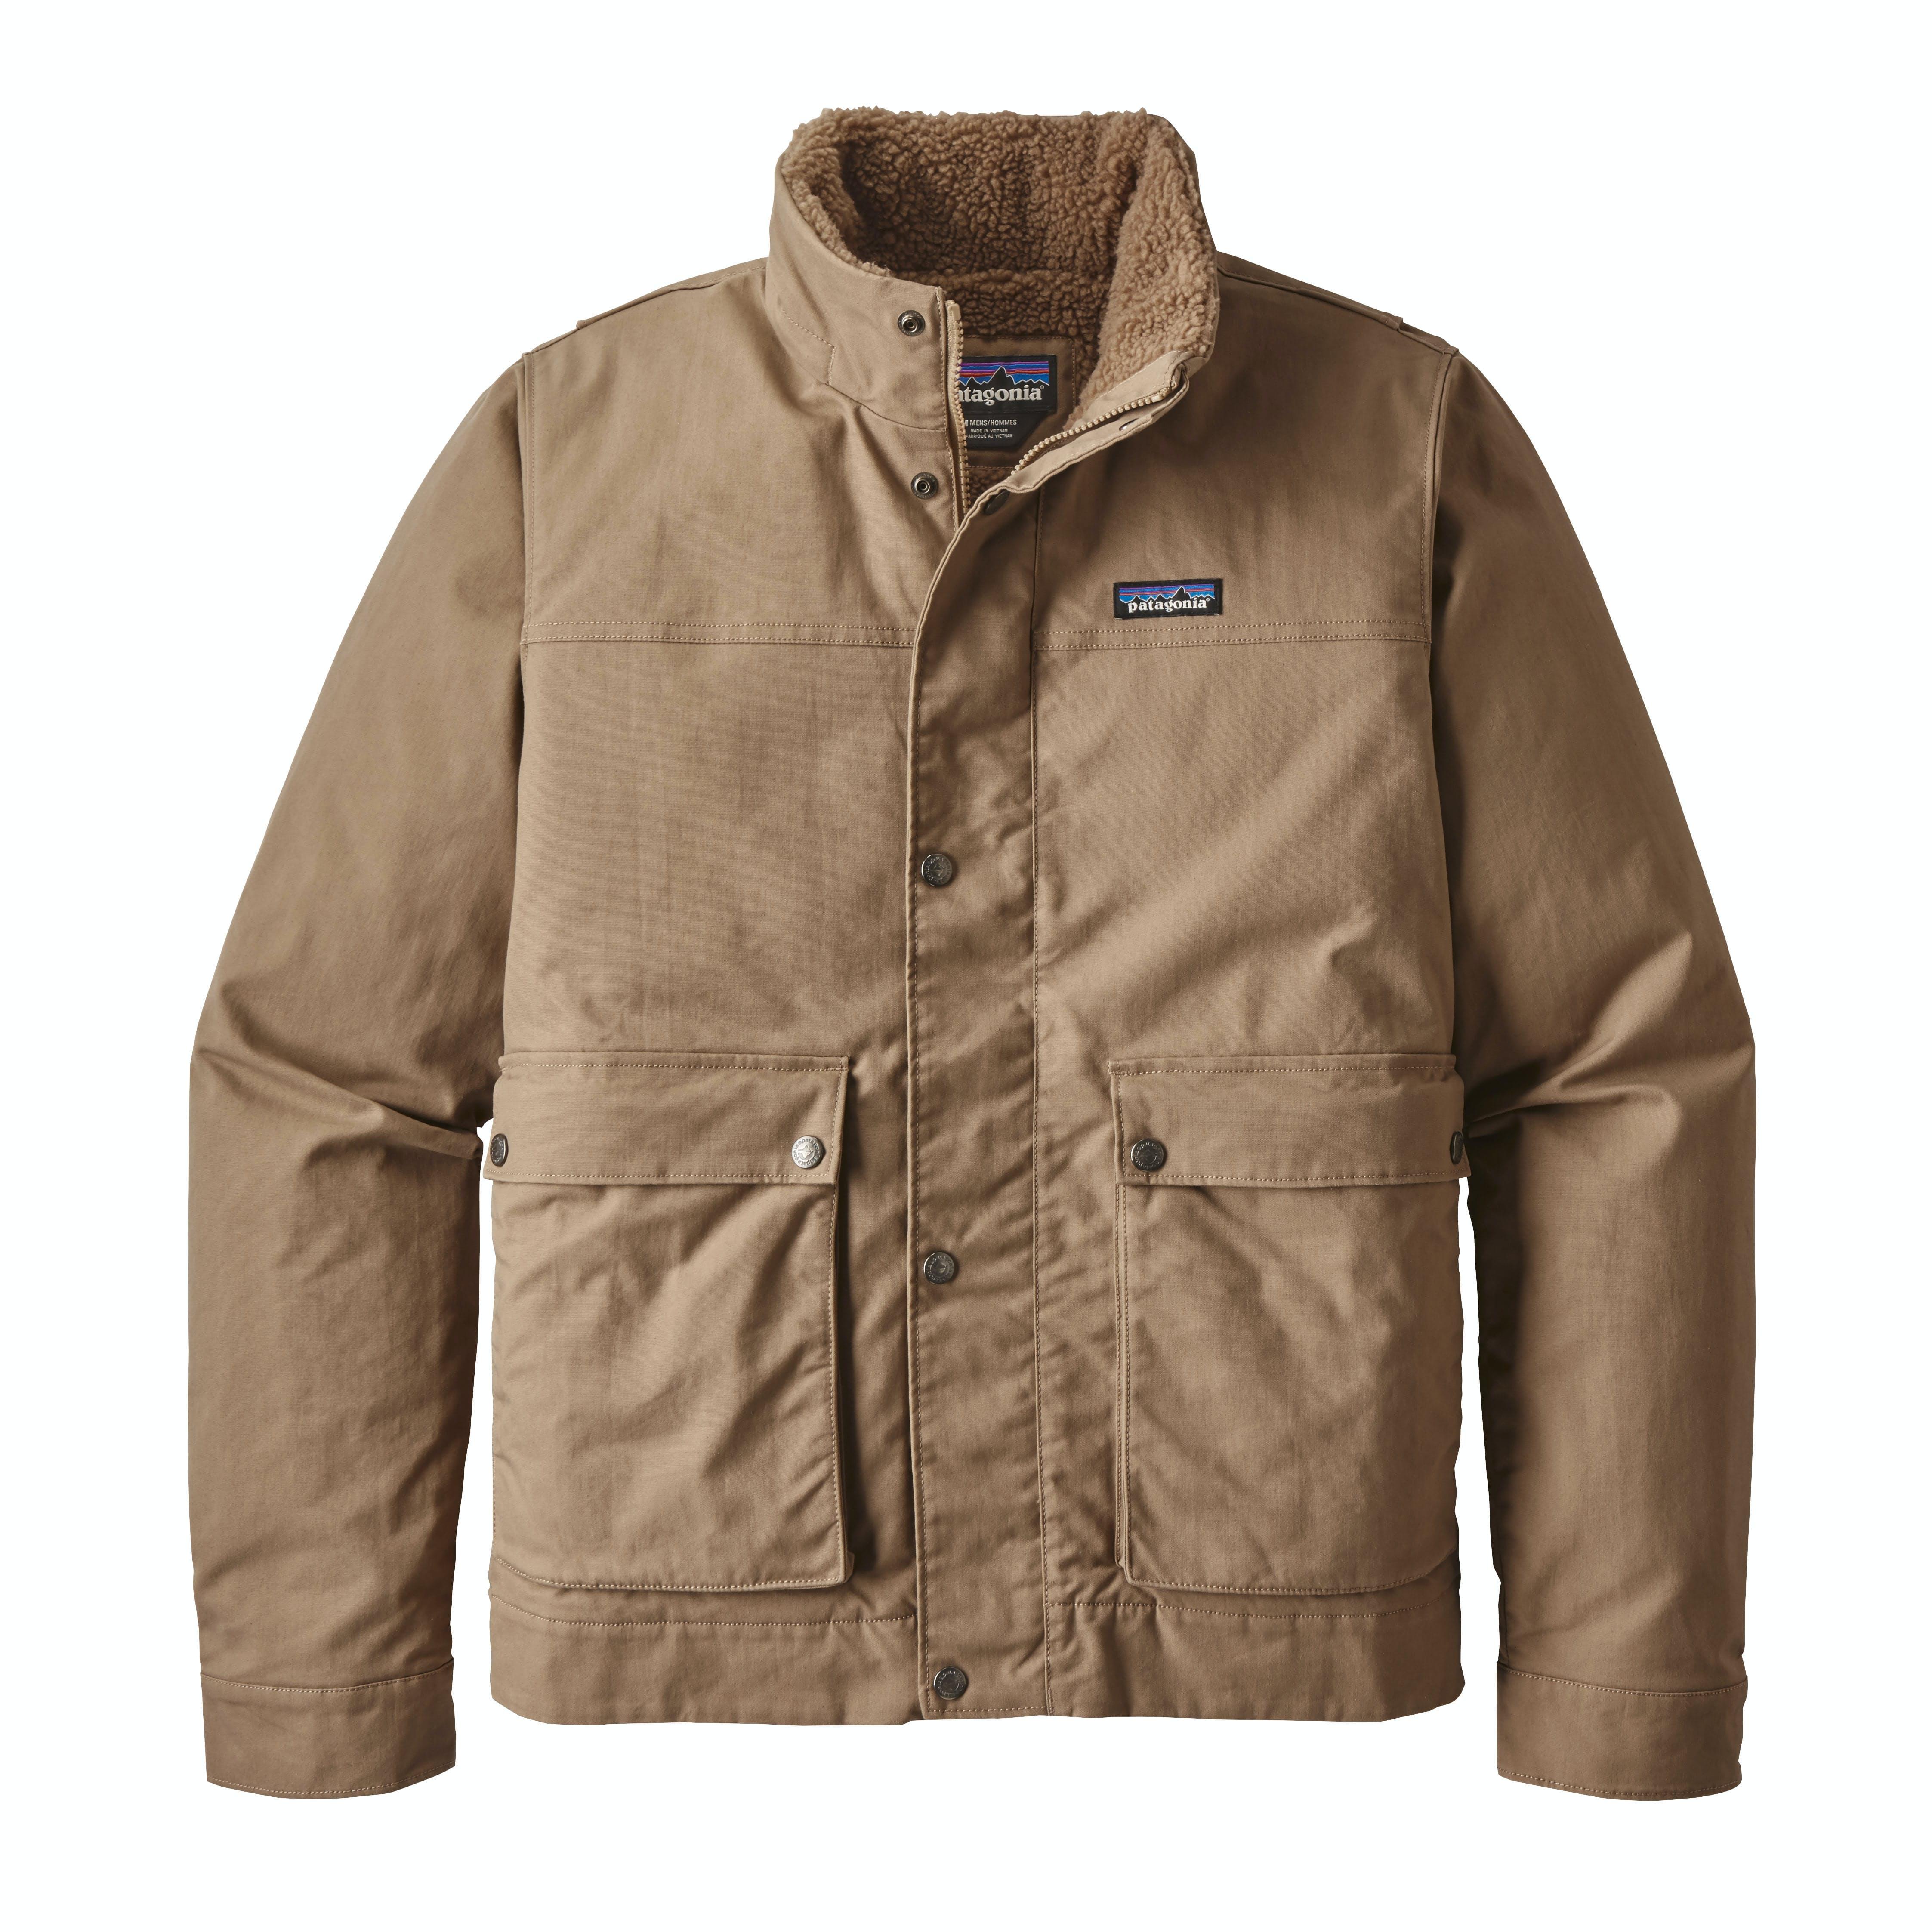 Yahnhjonb2 patagonia maple grove canvas jacket winter jackets 0 original